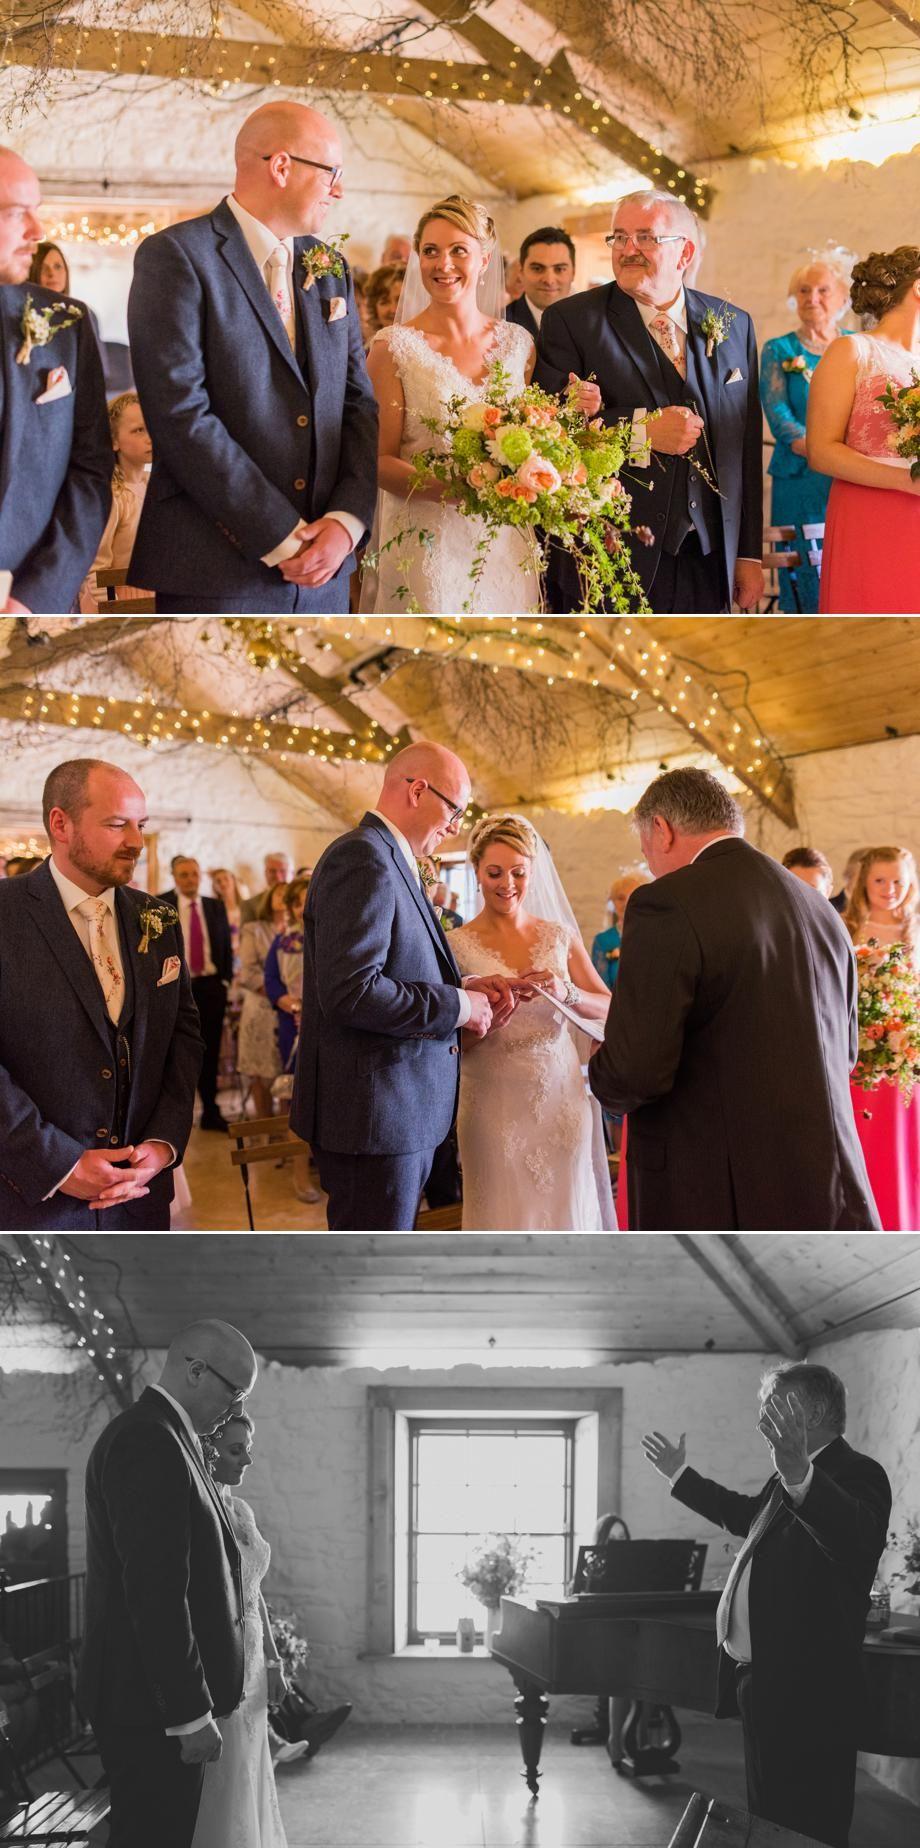 Limepark Wedding Reception Photography Mark Barton Pictures Ireland Northern Photographer